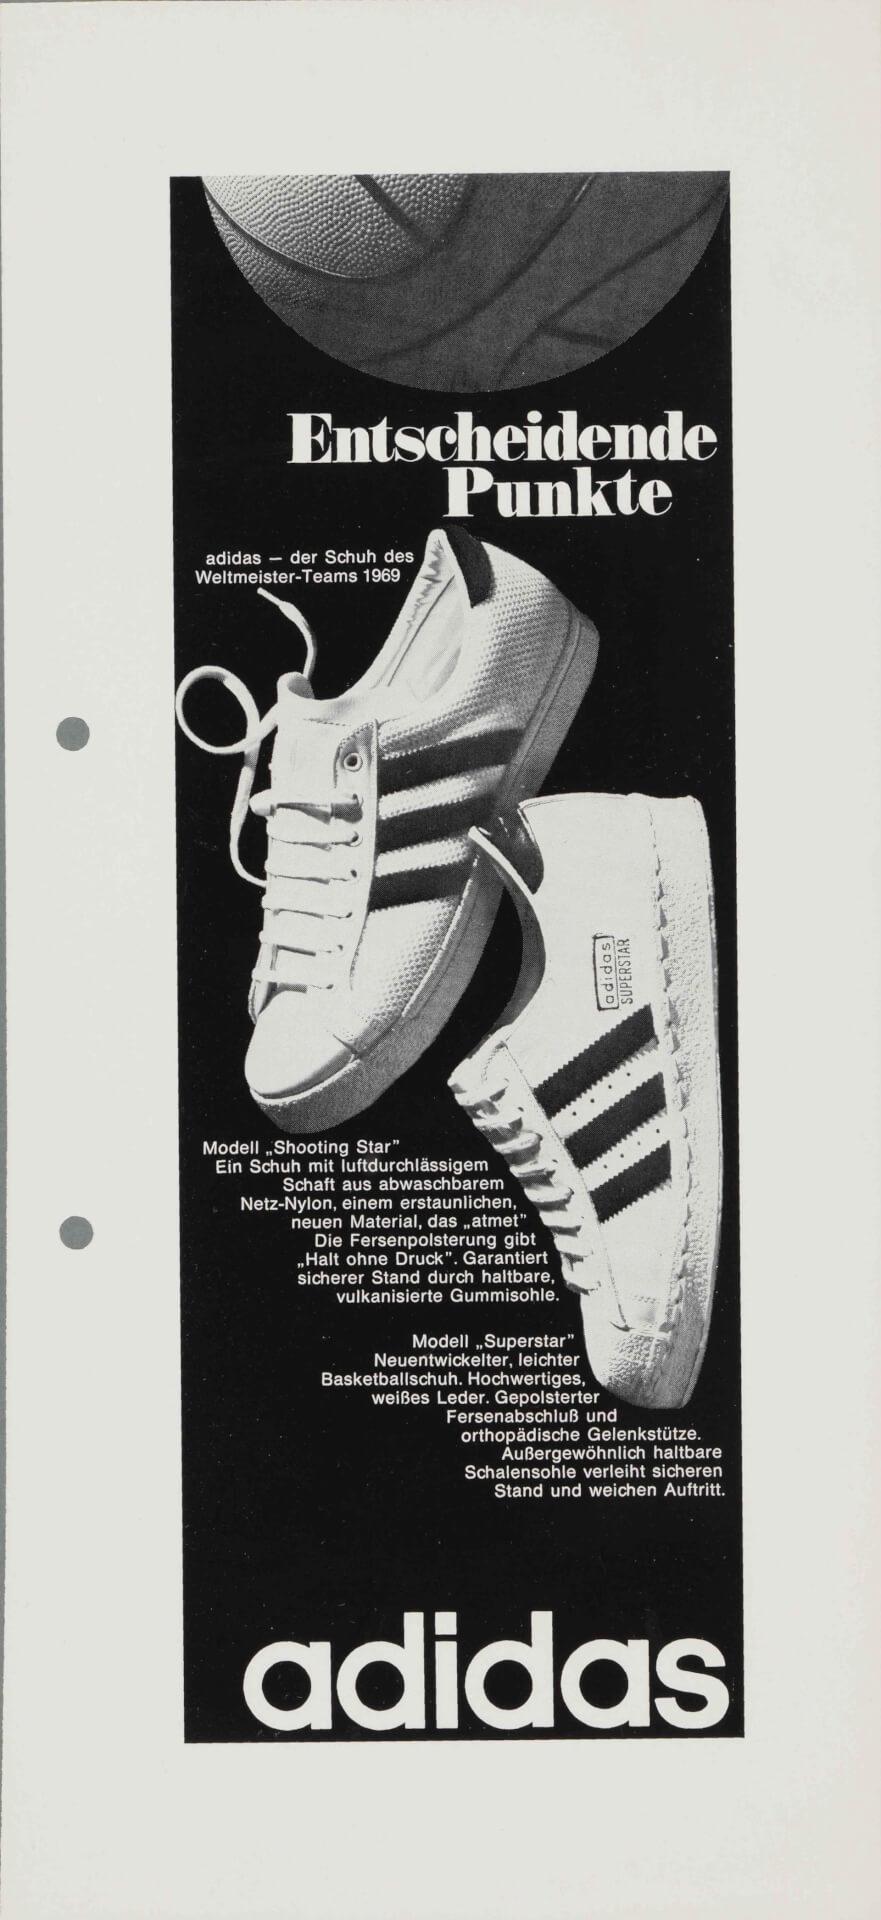 adidas「SUPERSTAR」の歴史を辿ったムービー『SUPERSTAR: THE HISTORY OF AN ICON』が公開|Run D.M.C.も登場 life200108_adidas_superstar_13